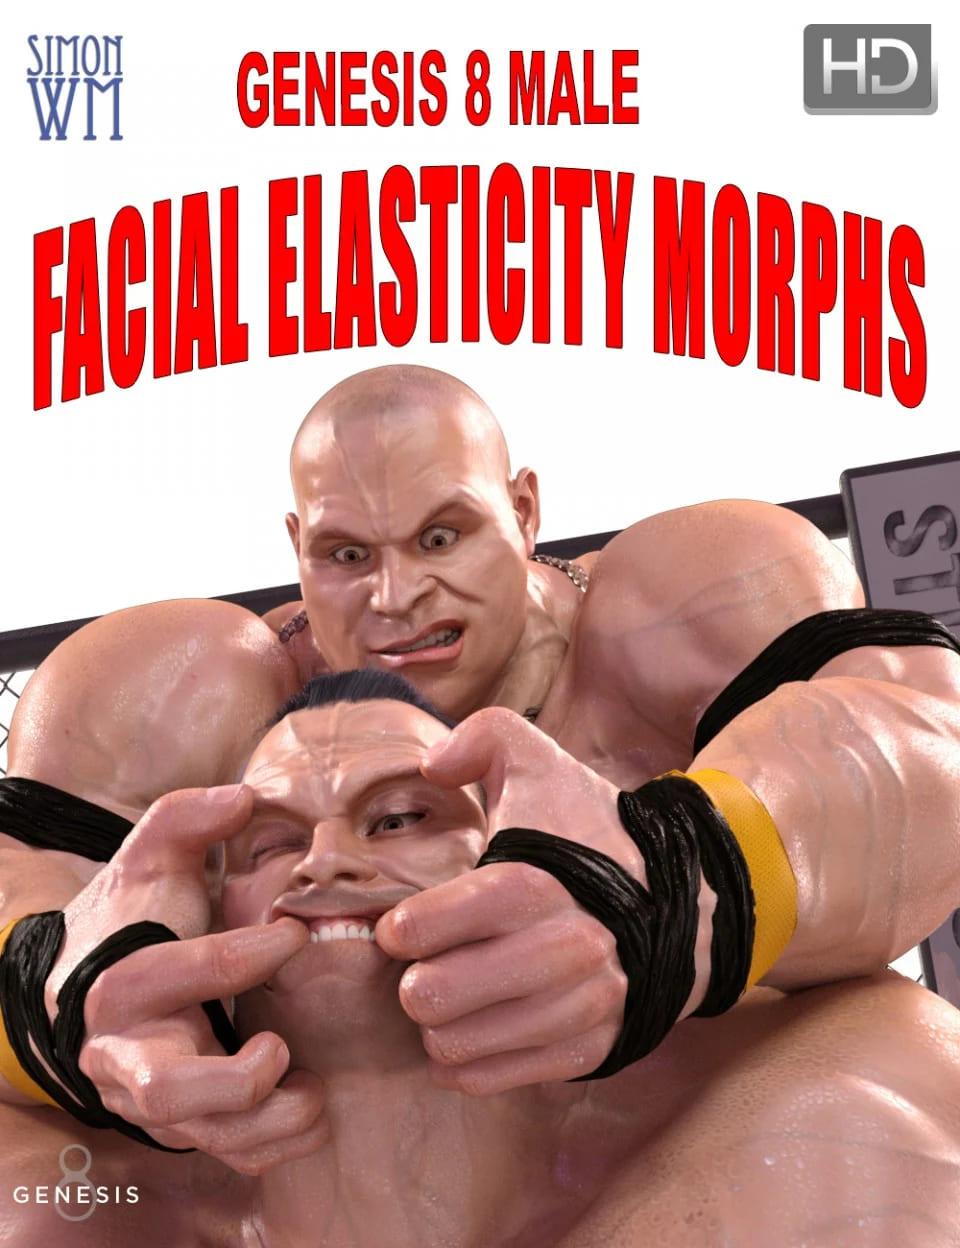 Genesis 8 Male Facial Elasticity Morphs_DAZ3D下载站